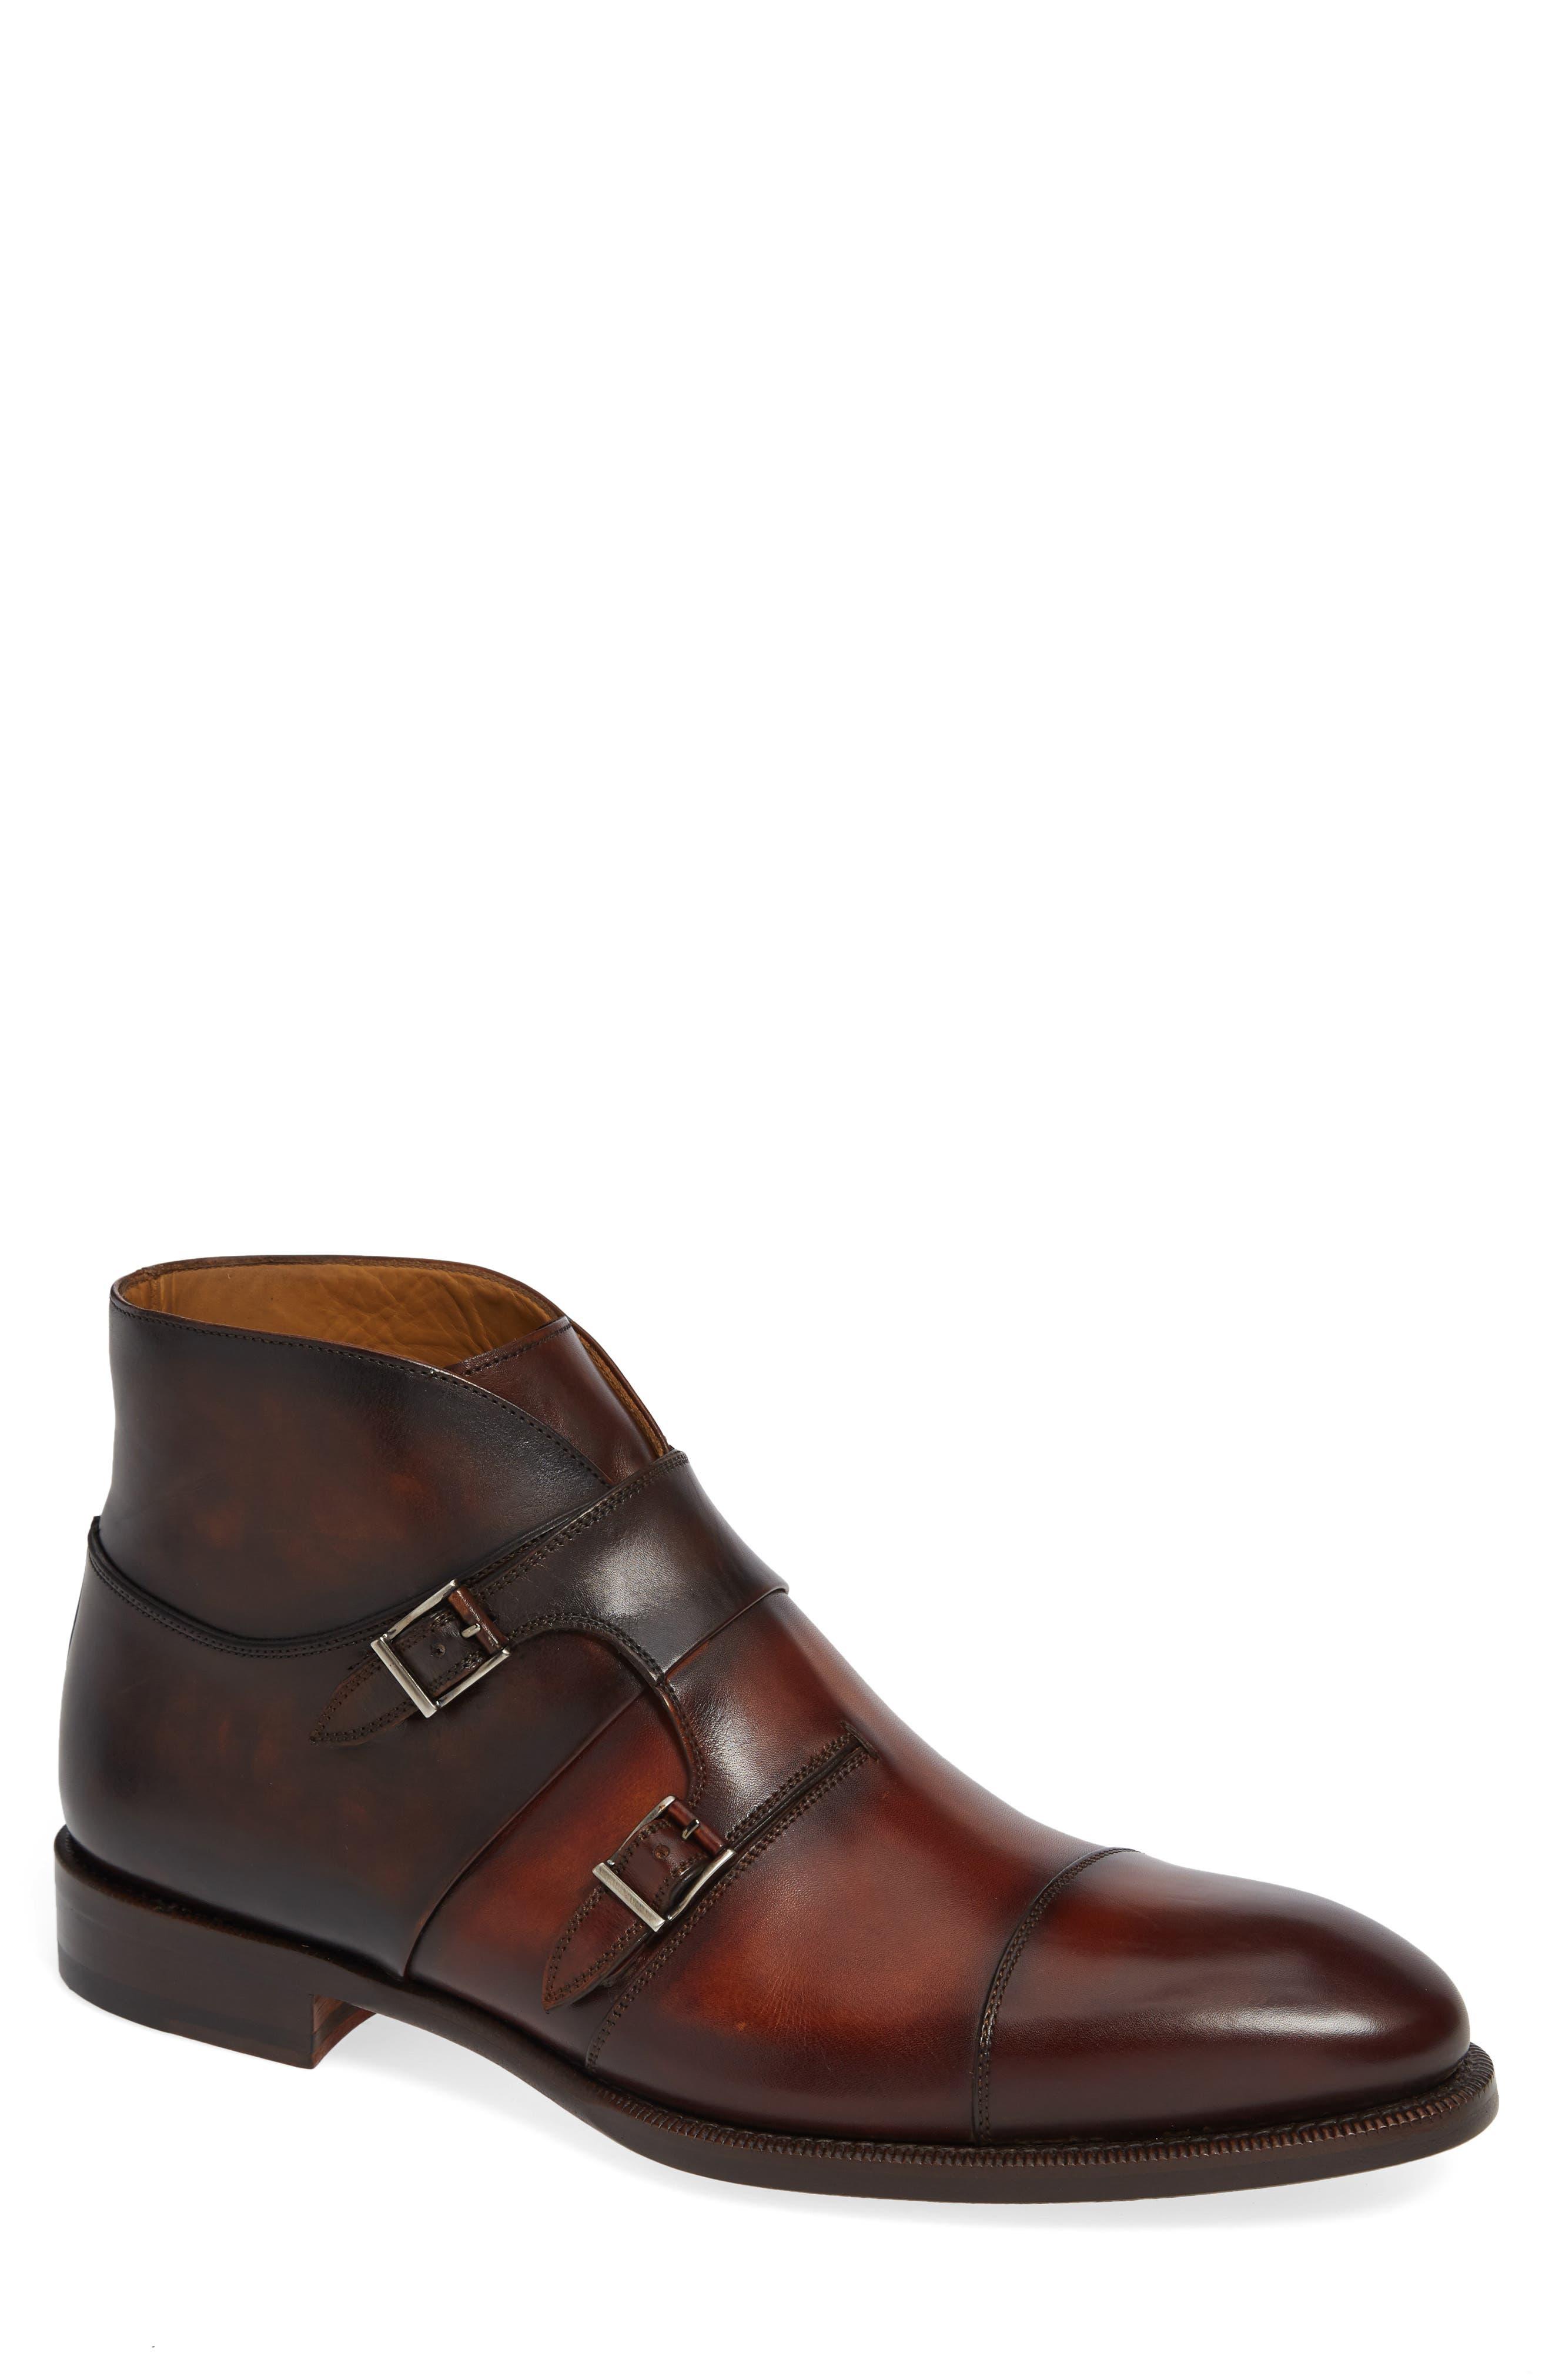 Dionicio Monk Strap Boot,                         Main,                         color, COGNAC LEATHER